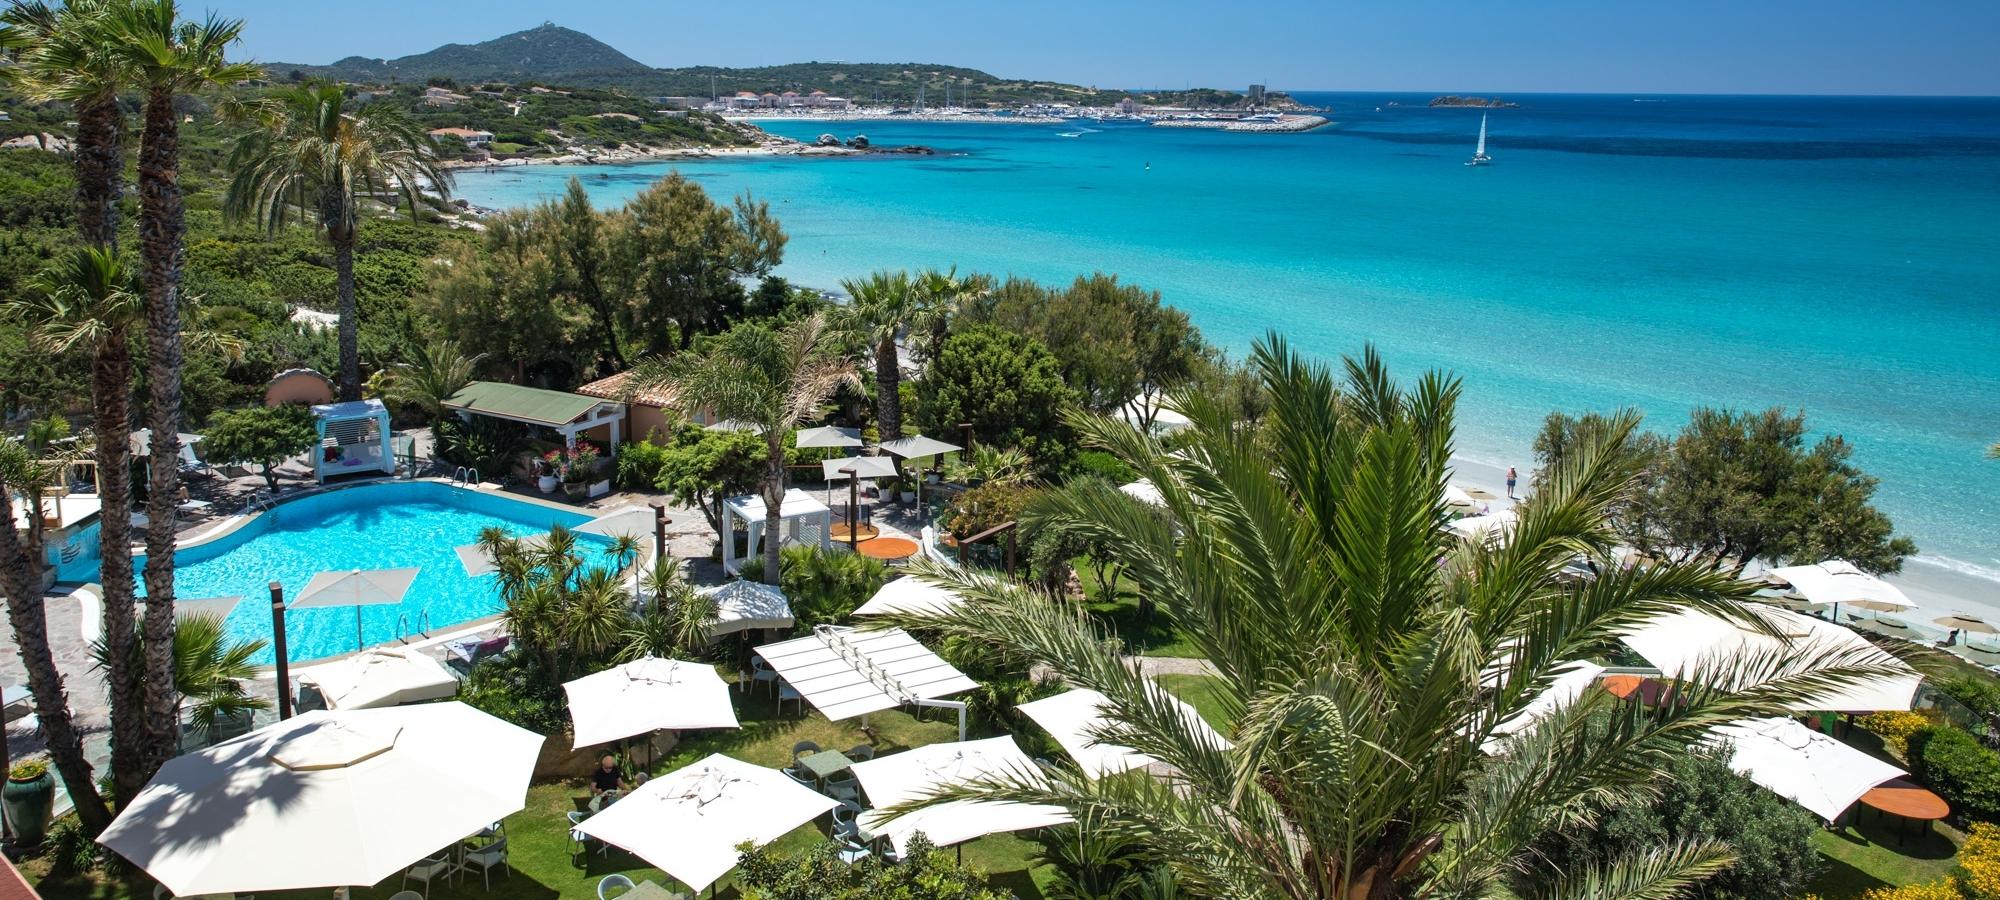 Hotel Stella Maris 4 Villasimius Offizielle Website